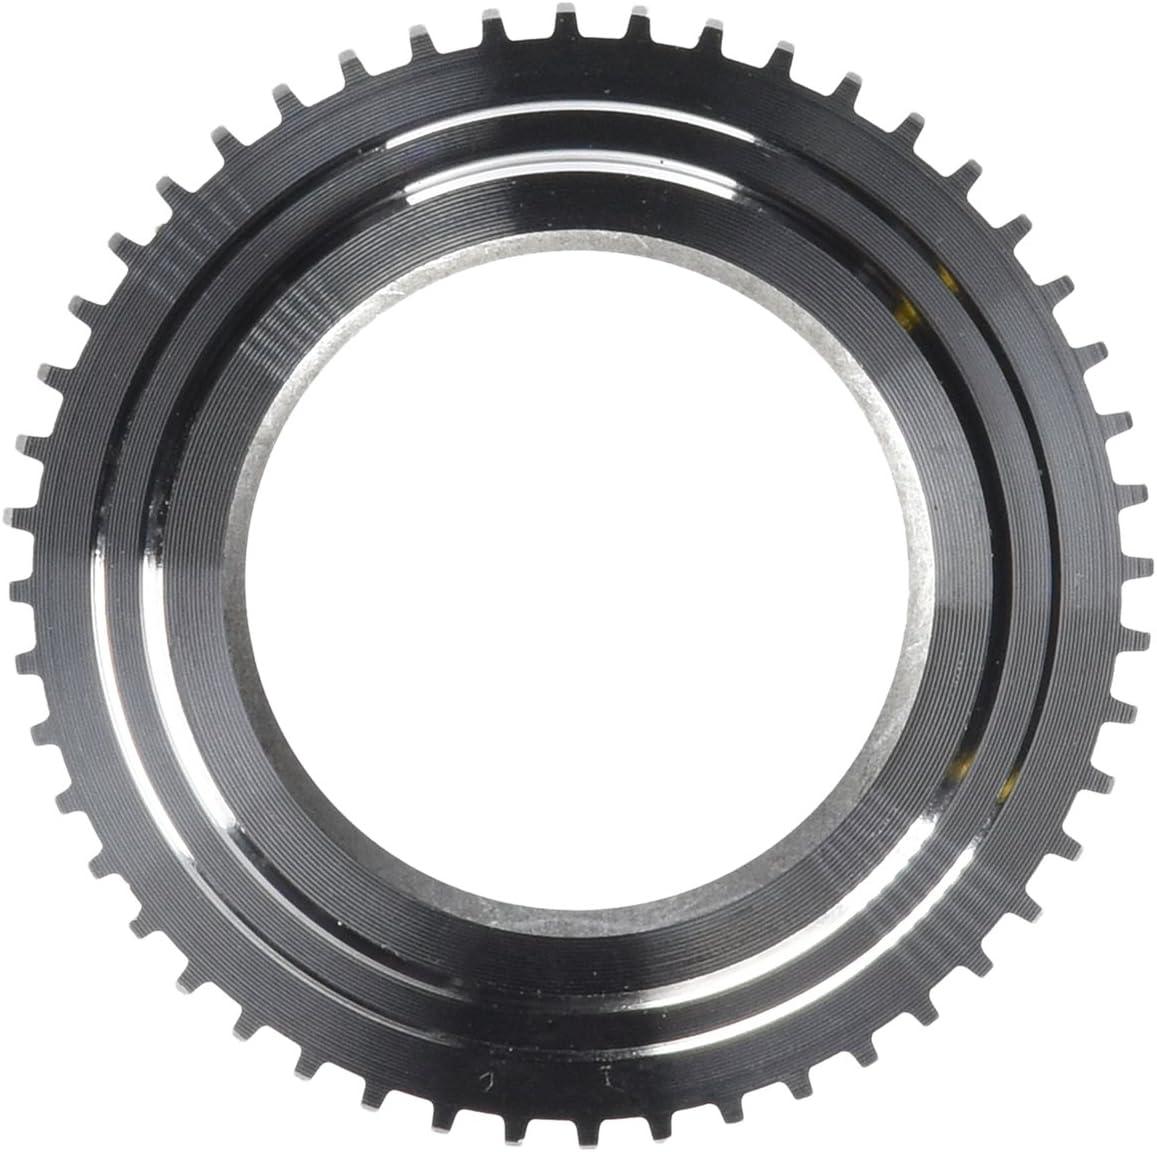 Skid Control, Rotor Genuine Toyota Parts 43517-35010